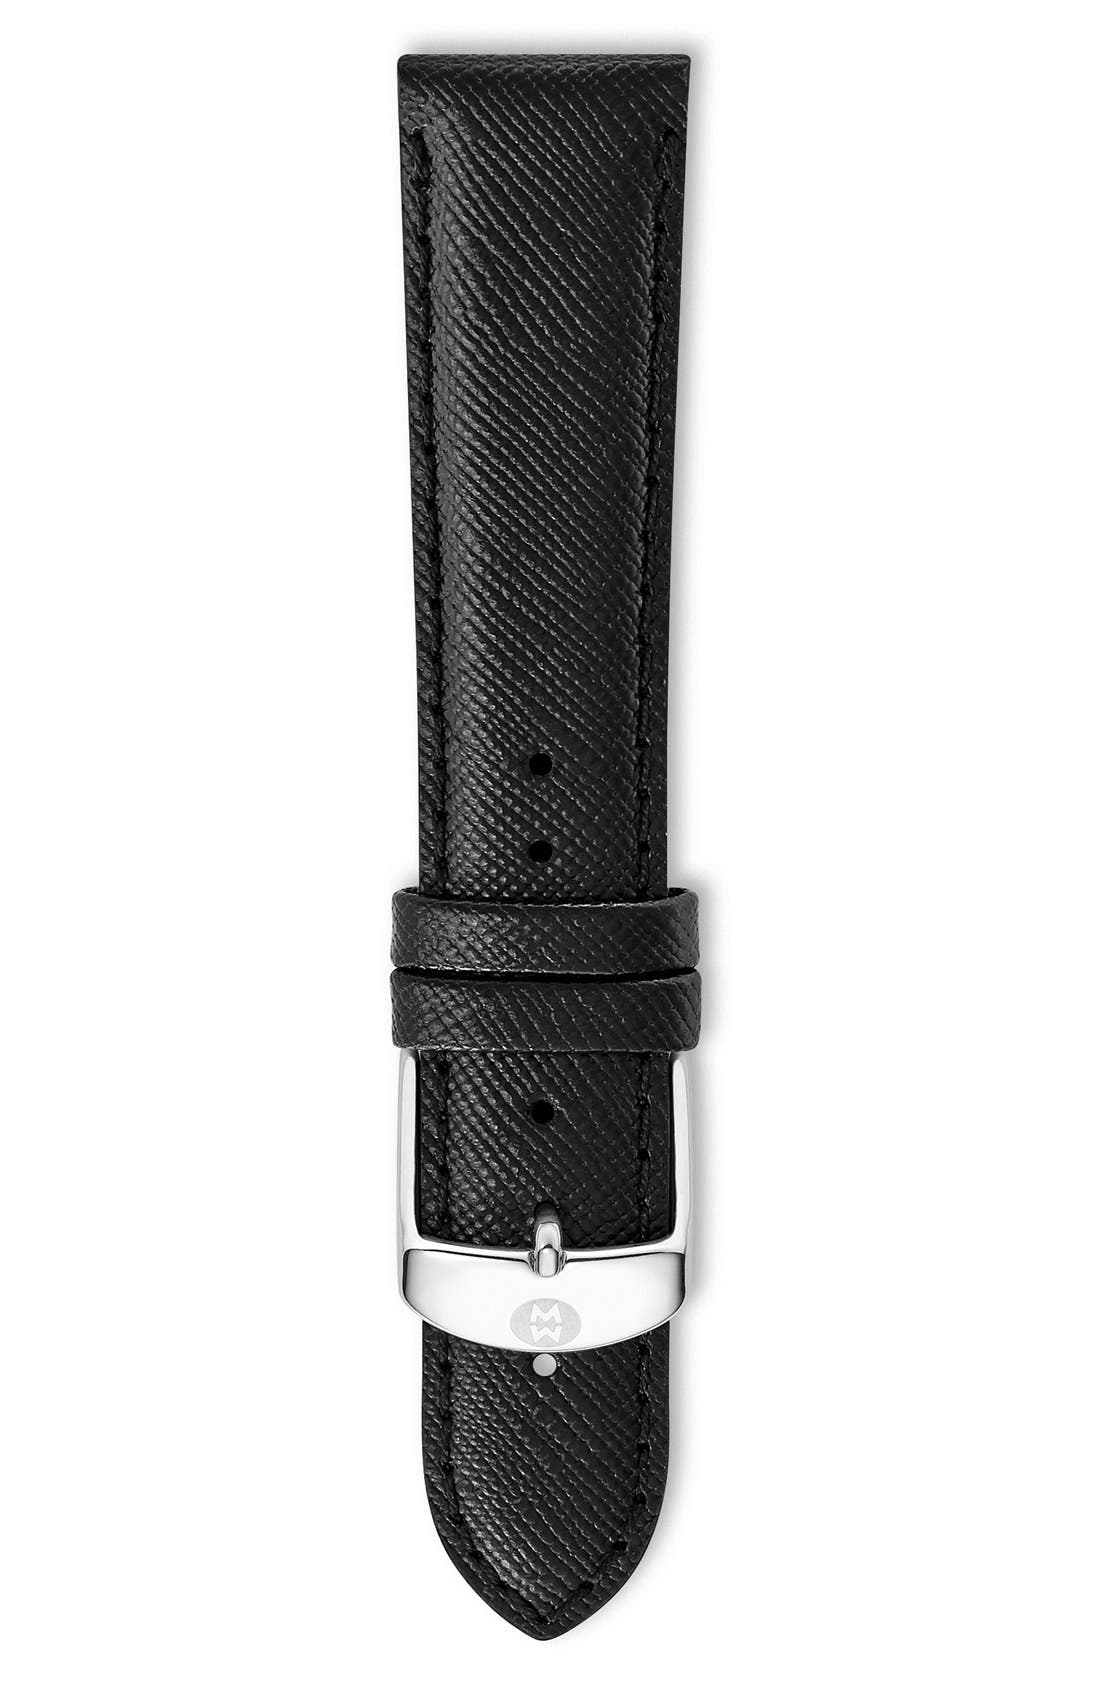 Main Image - MICHELE 20mm Saffiano Leather Watch Strap